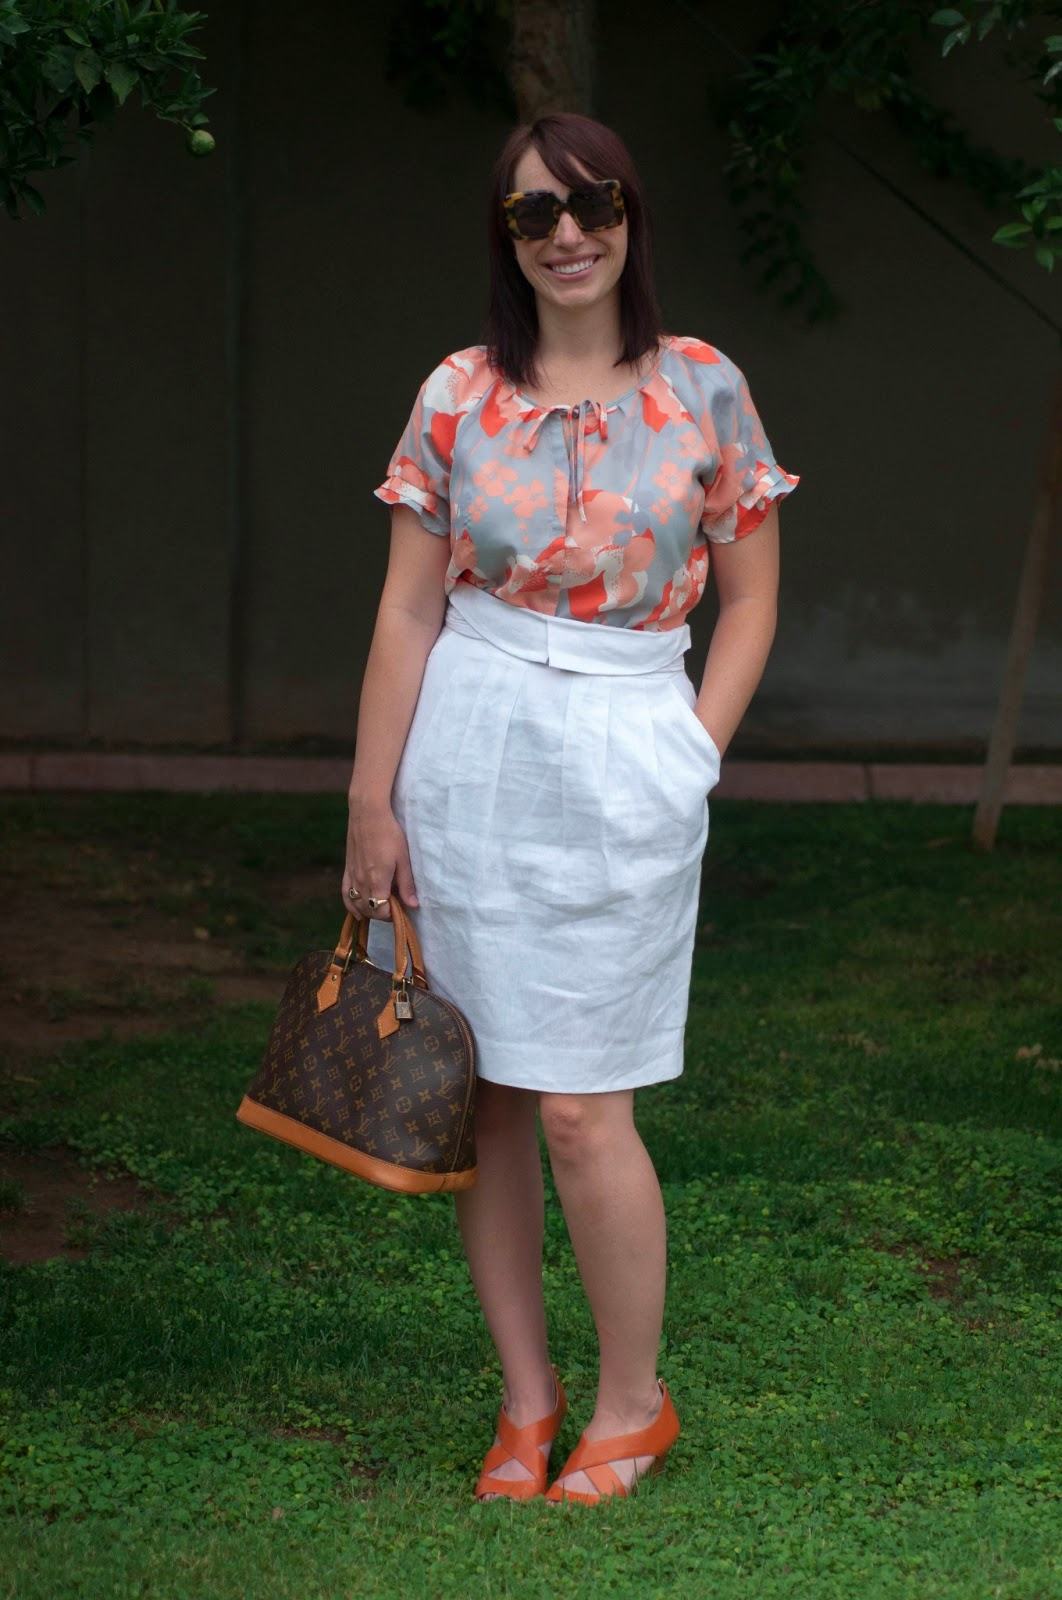 style blog, fashion blog, louis vuitton, bcbg skirt, orange shoes, banana republic, floral top, banana republic silk blouse